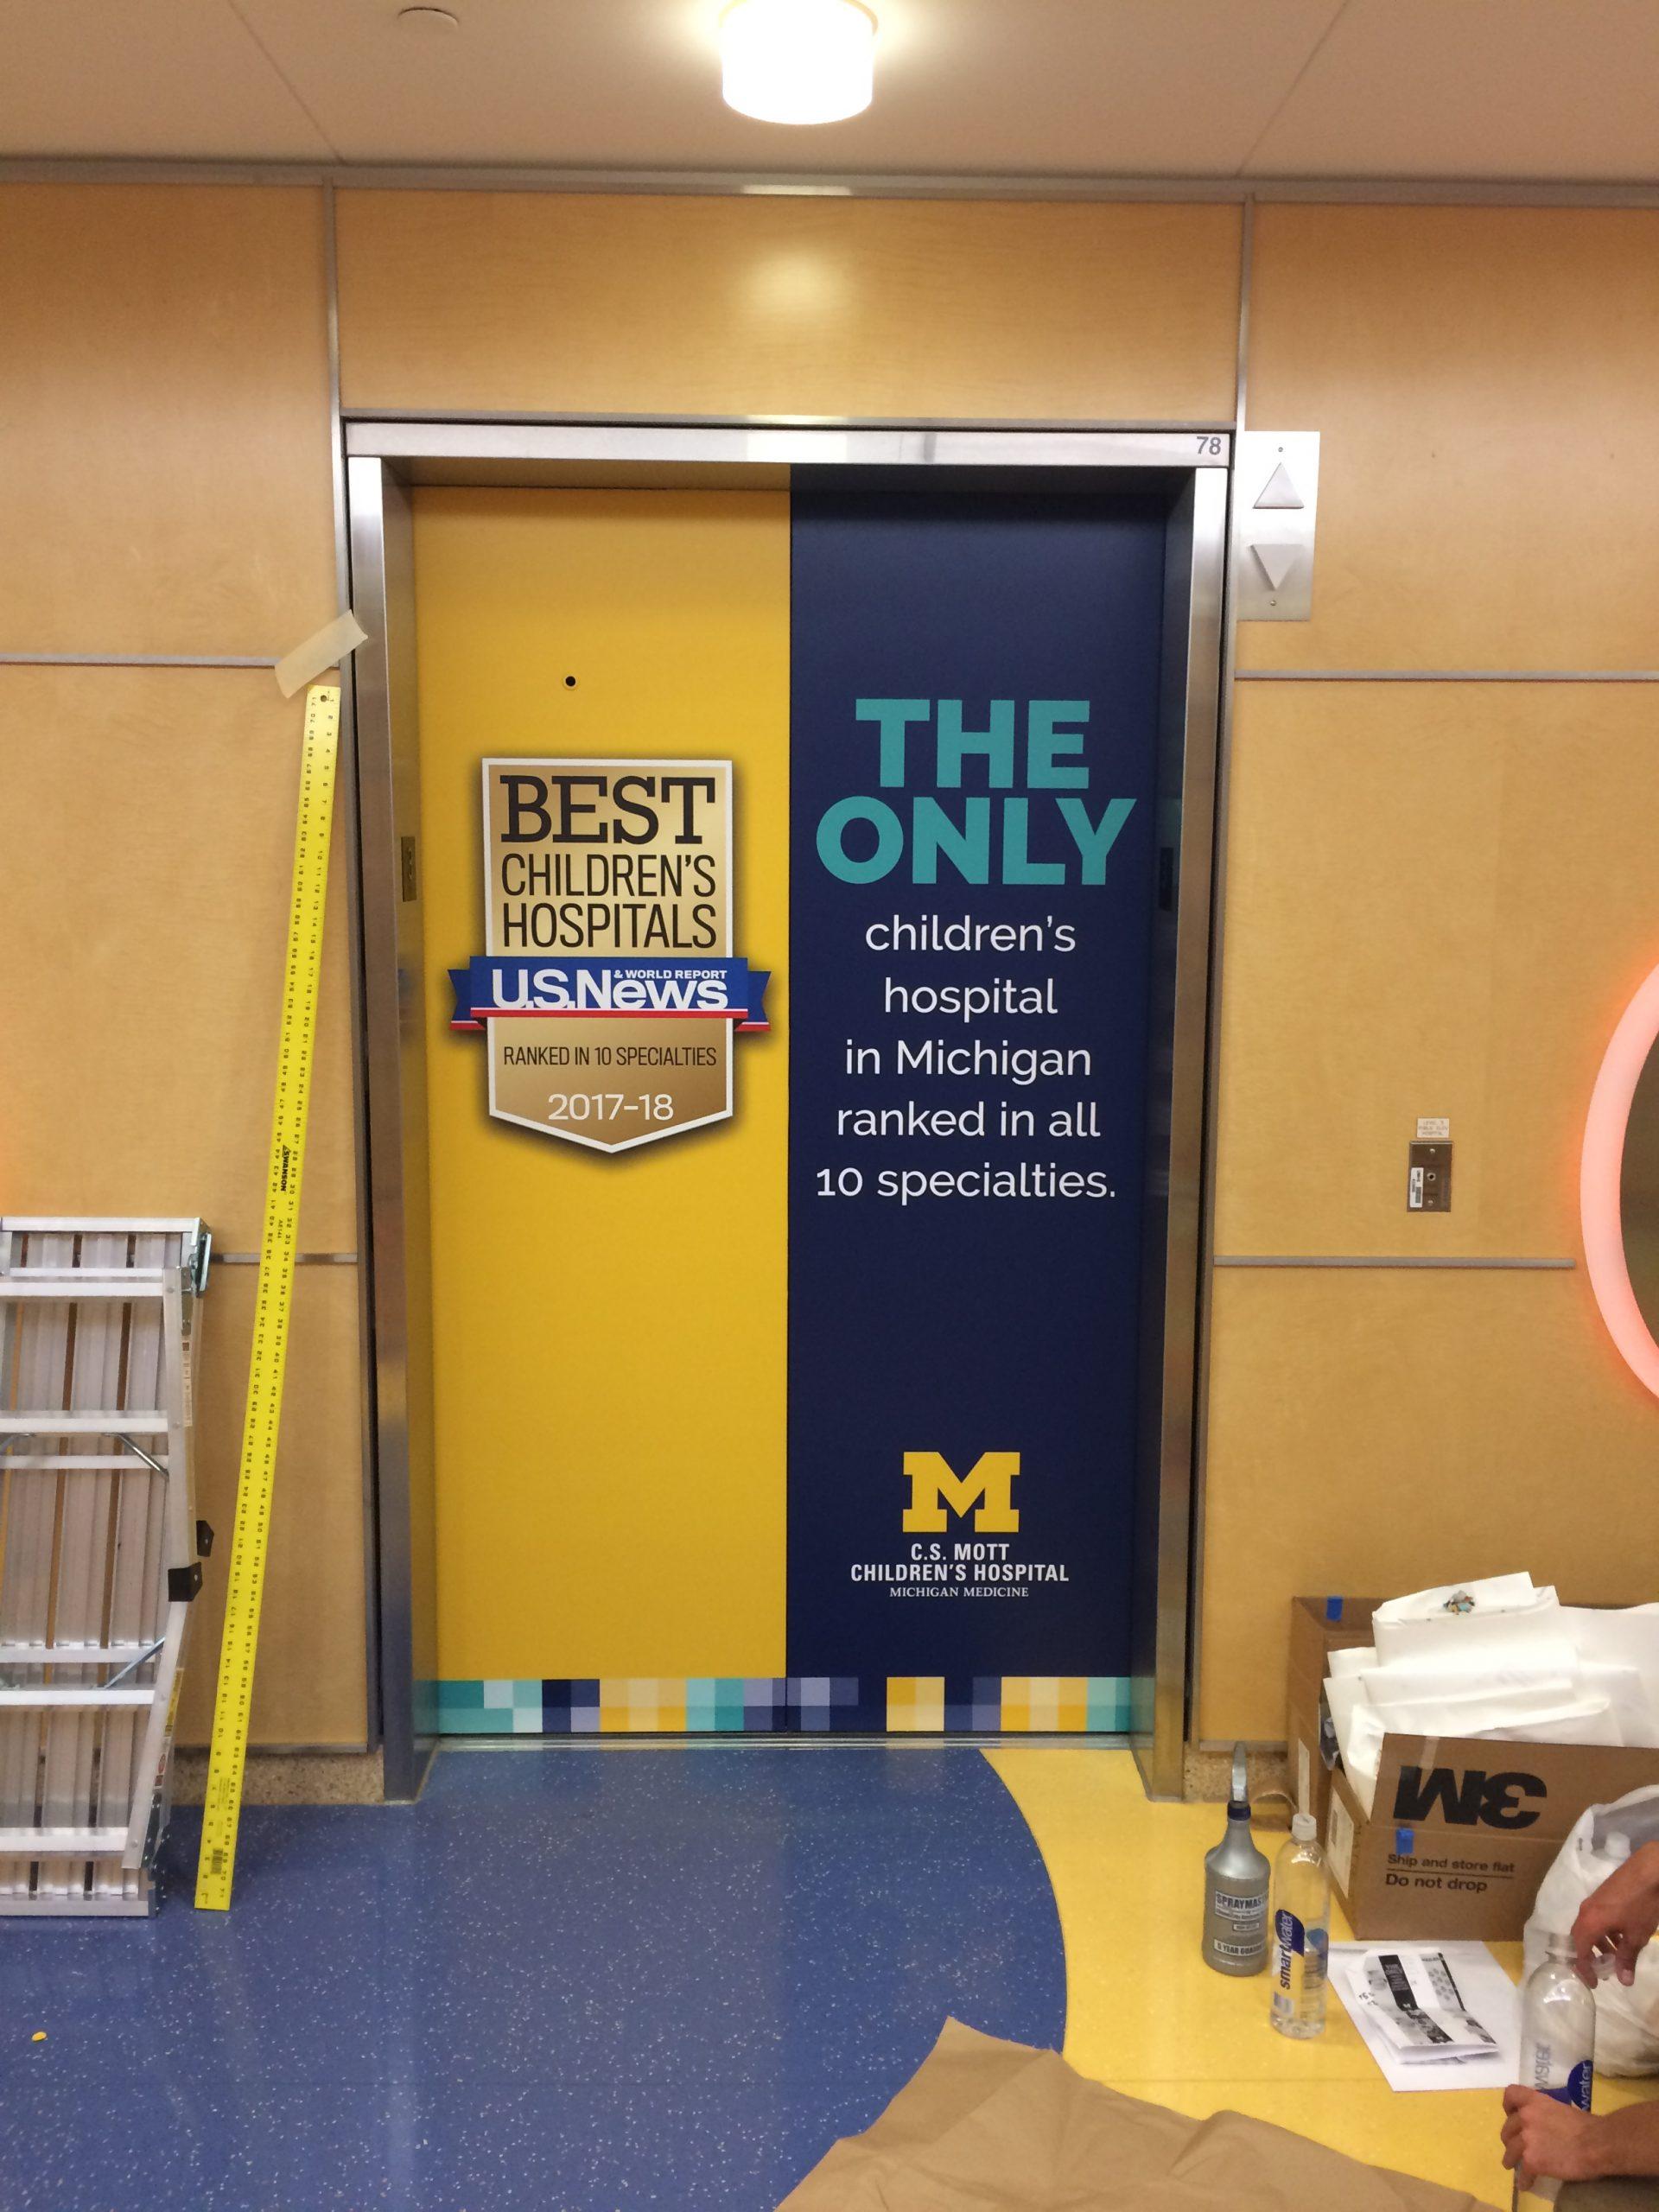 CS Mott Childrens Hospital Elevators - 04